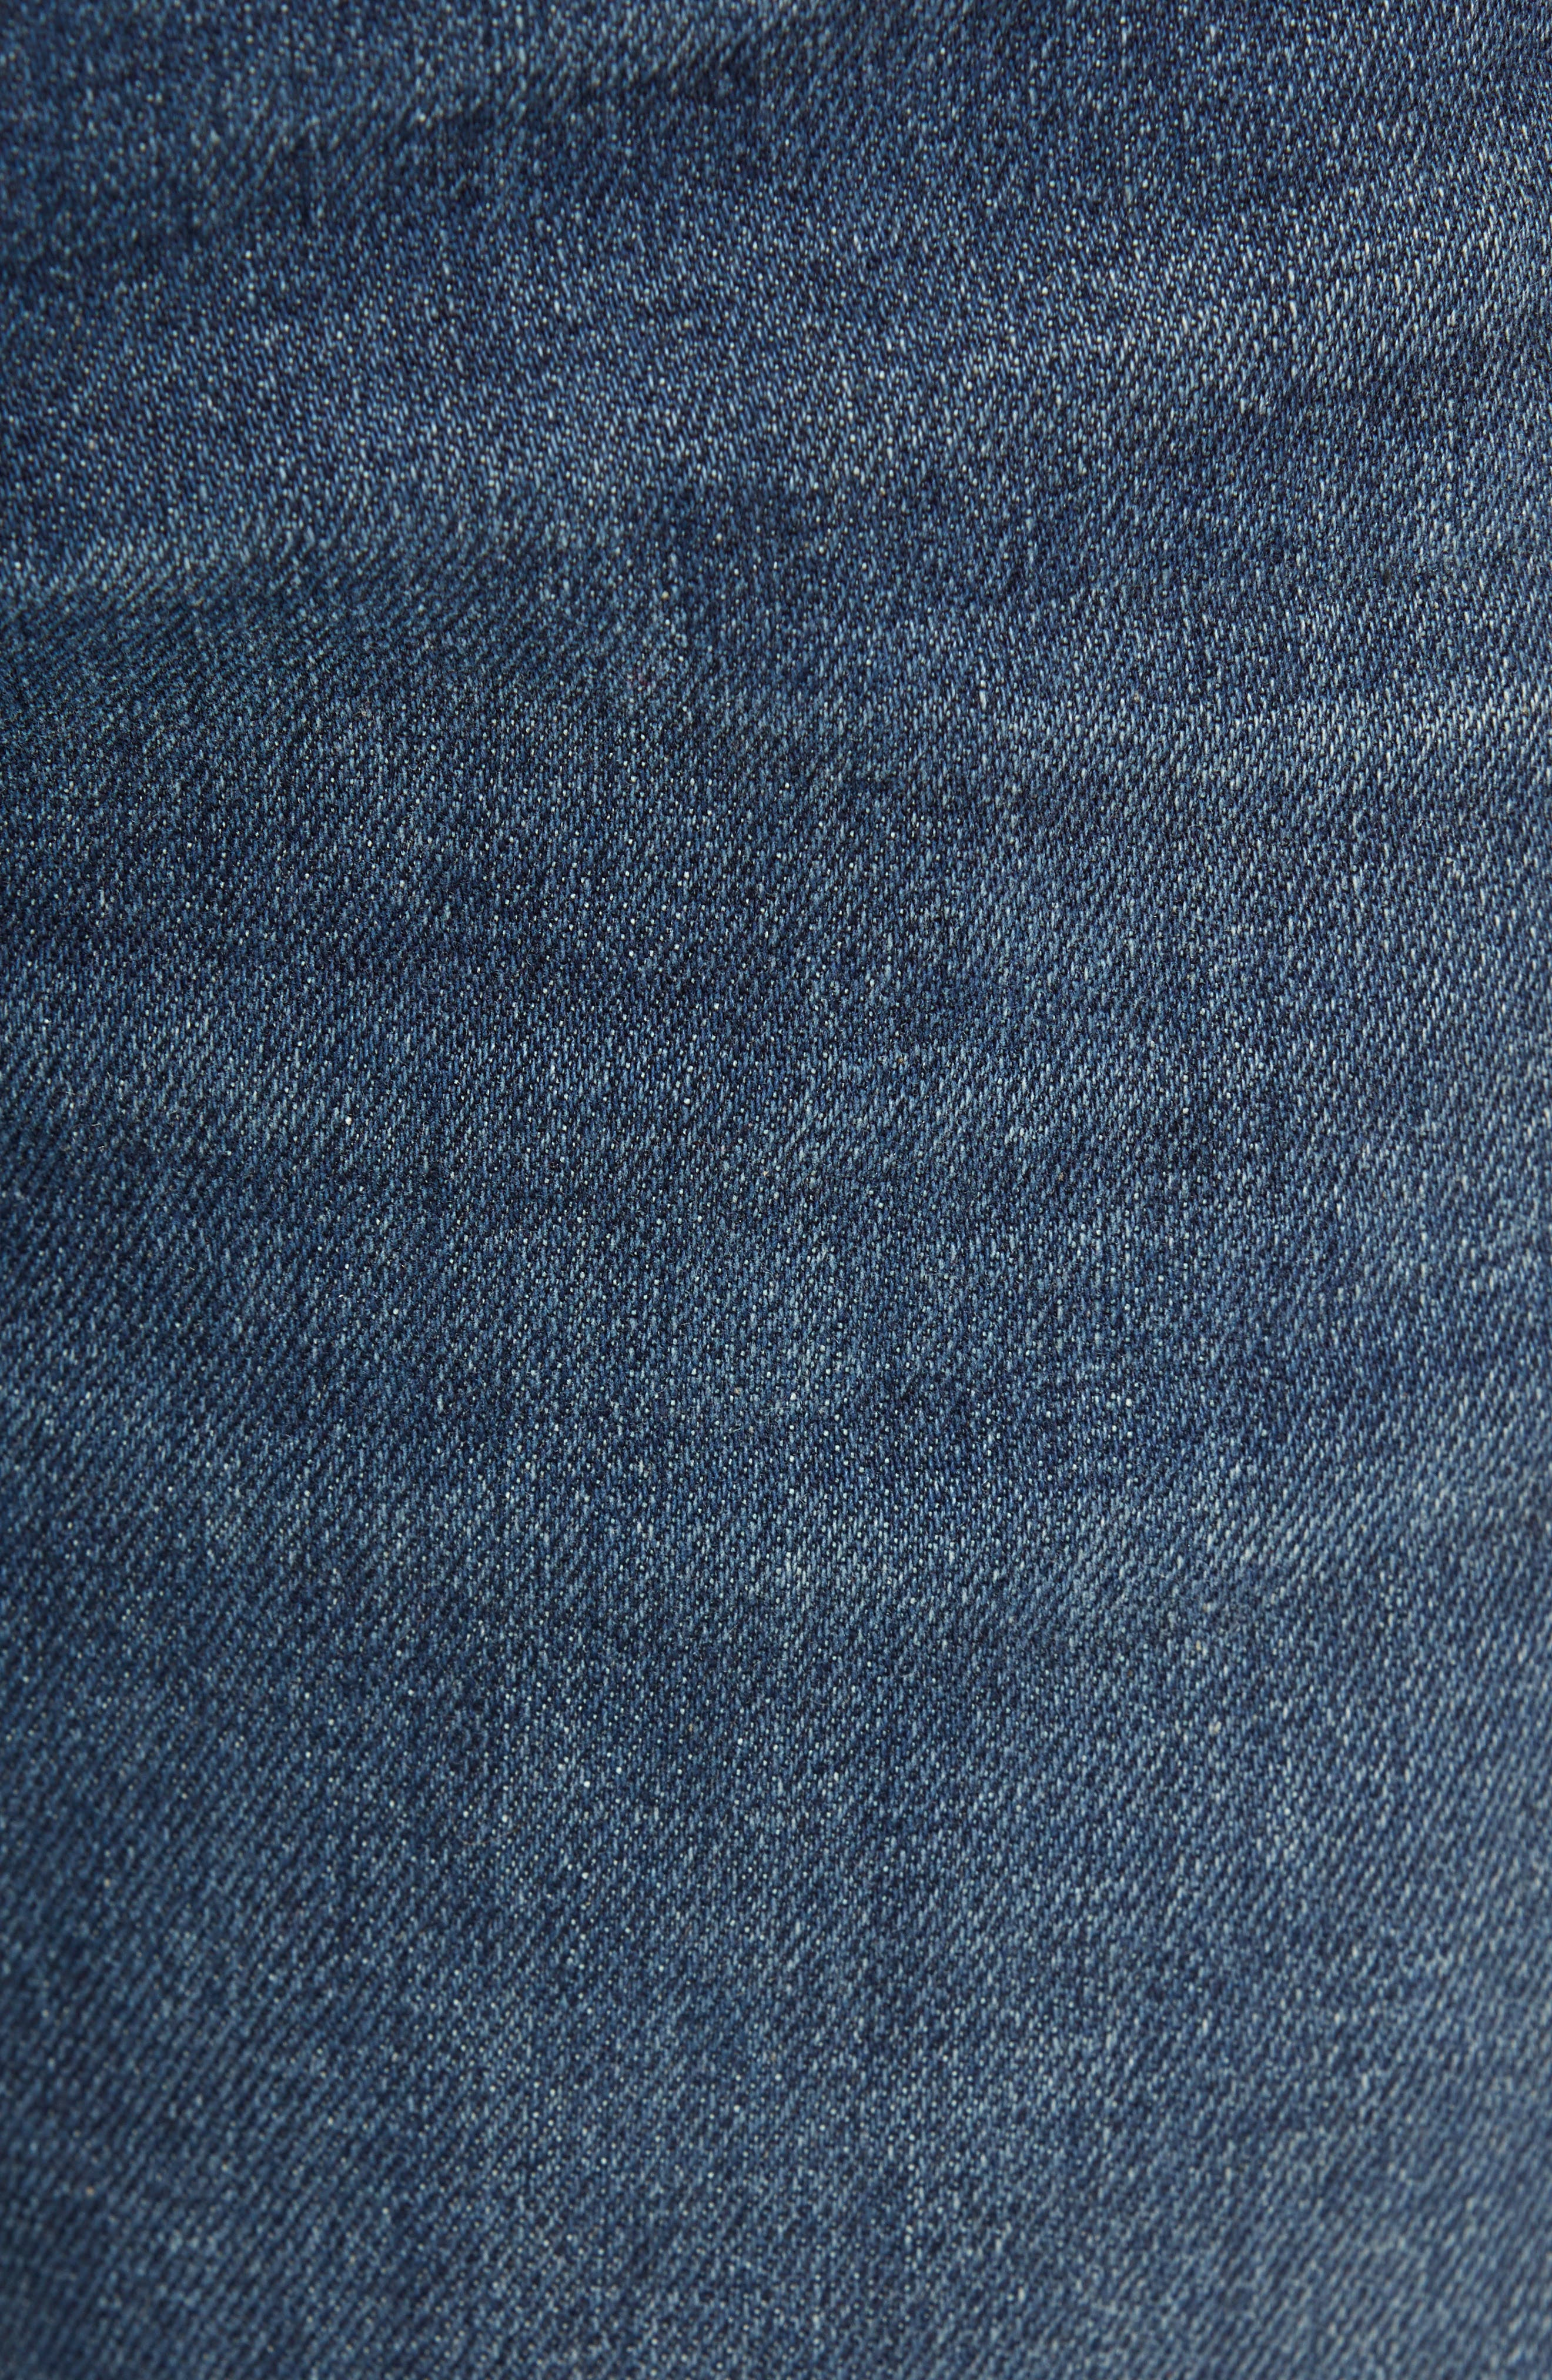 Jimmy Slim Straight Leg Jeans,                             Alternate thumbnail 5, color,                             NIAGARA